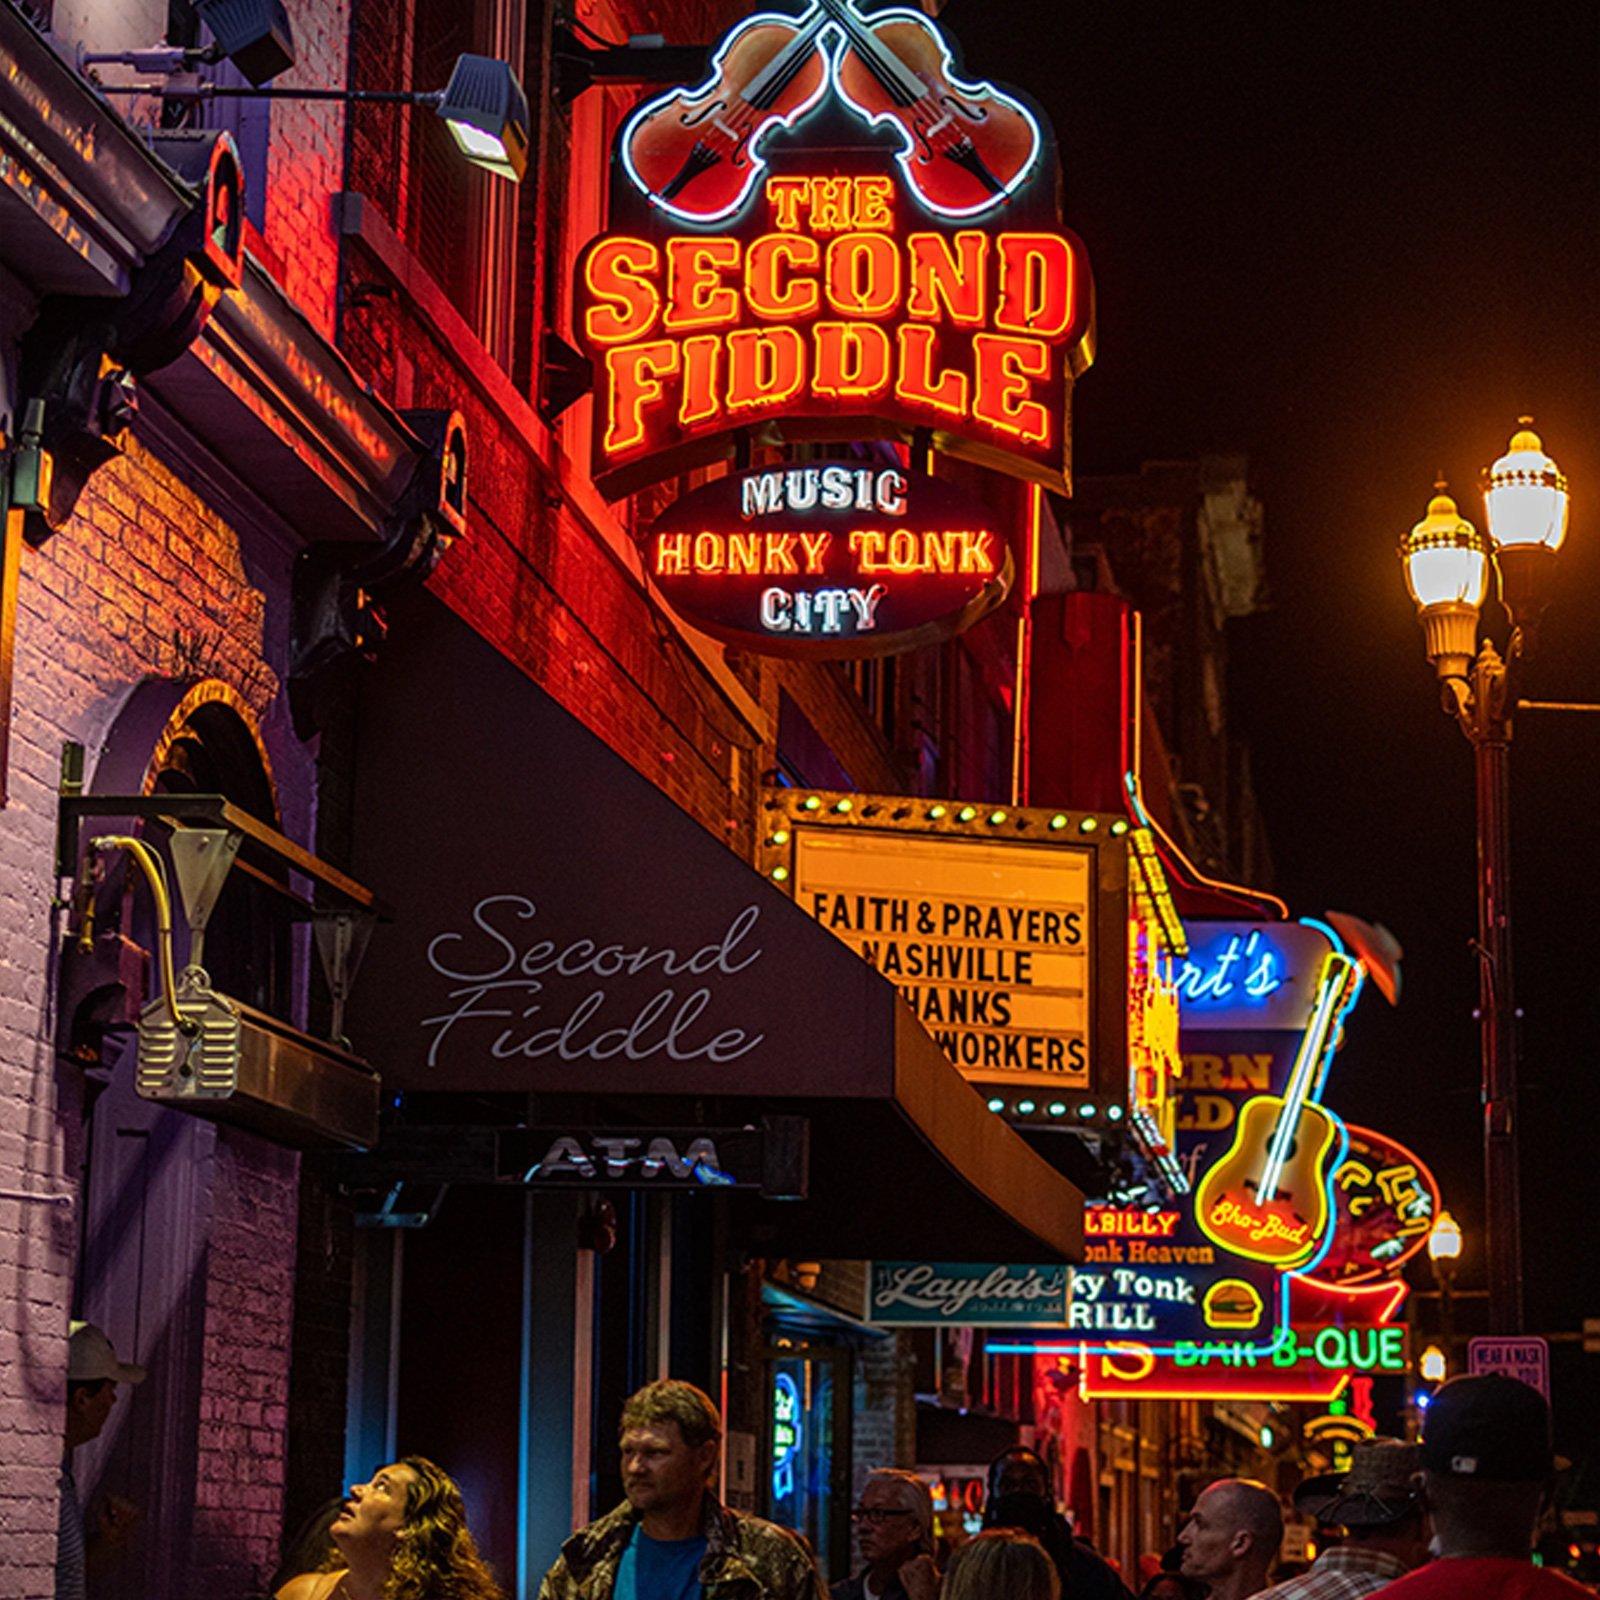 Downtown Nashville - The Second Fiddle